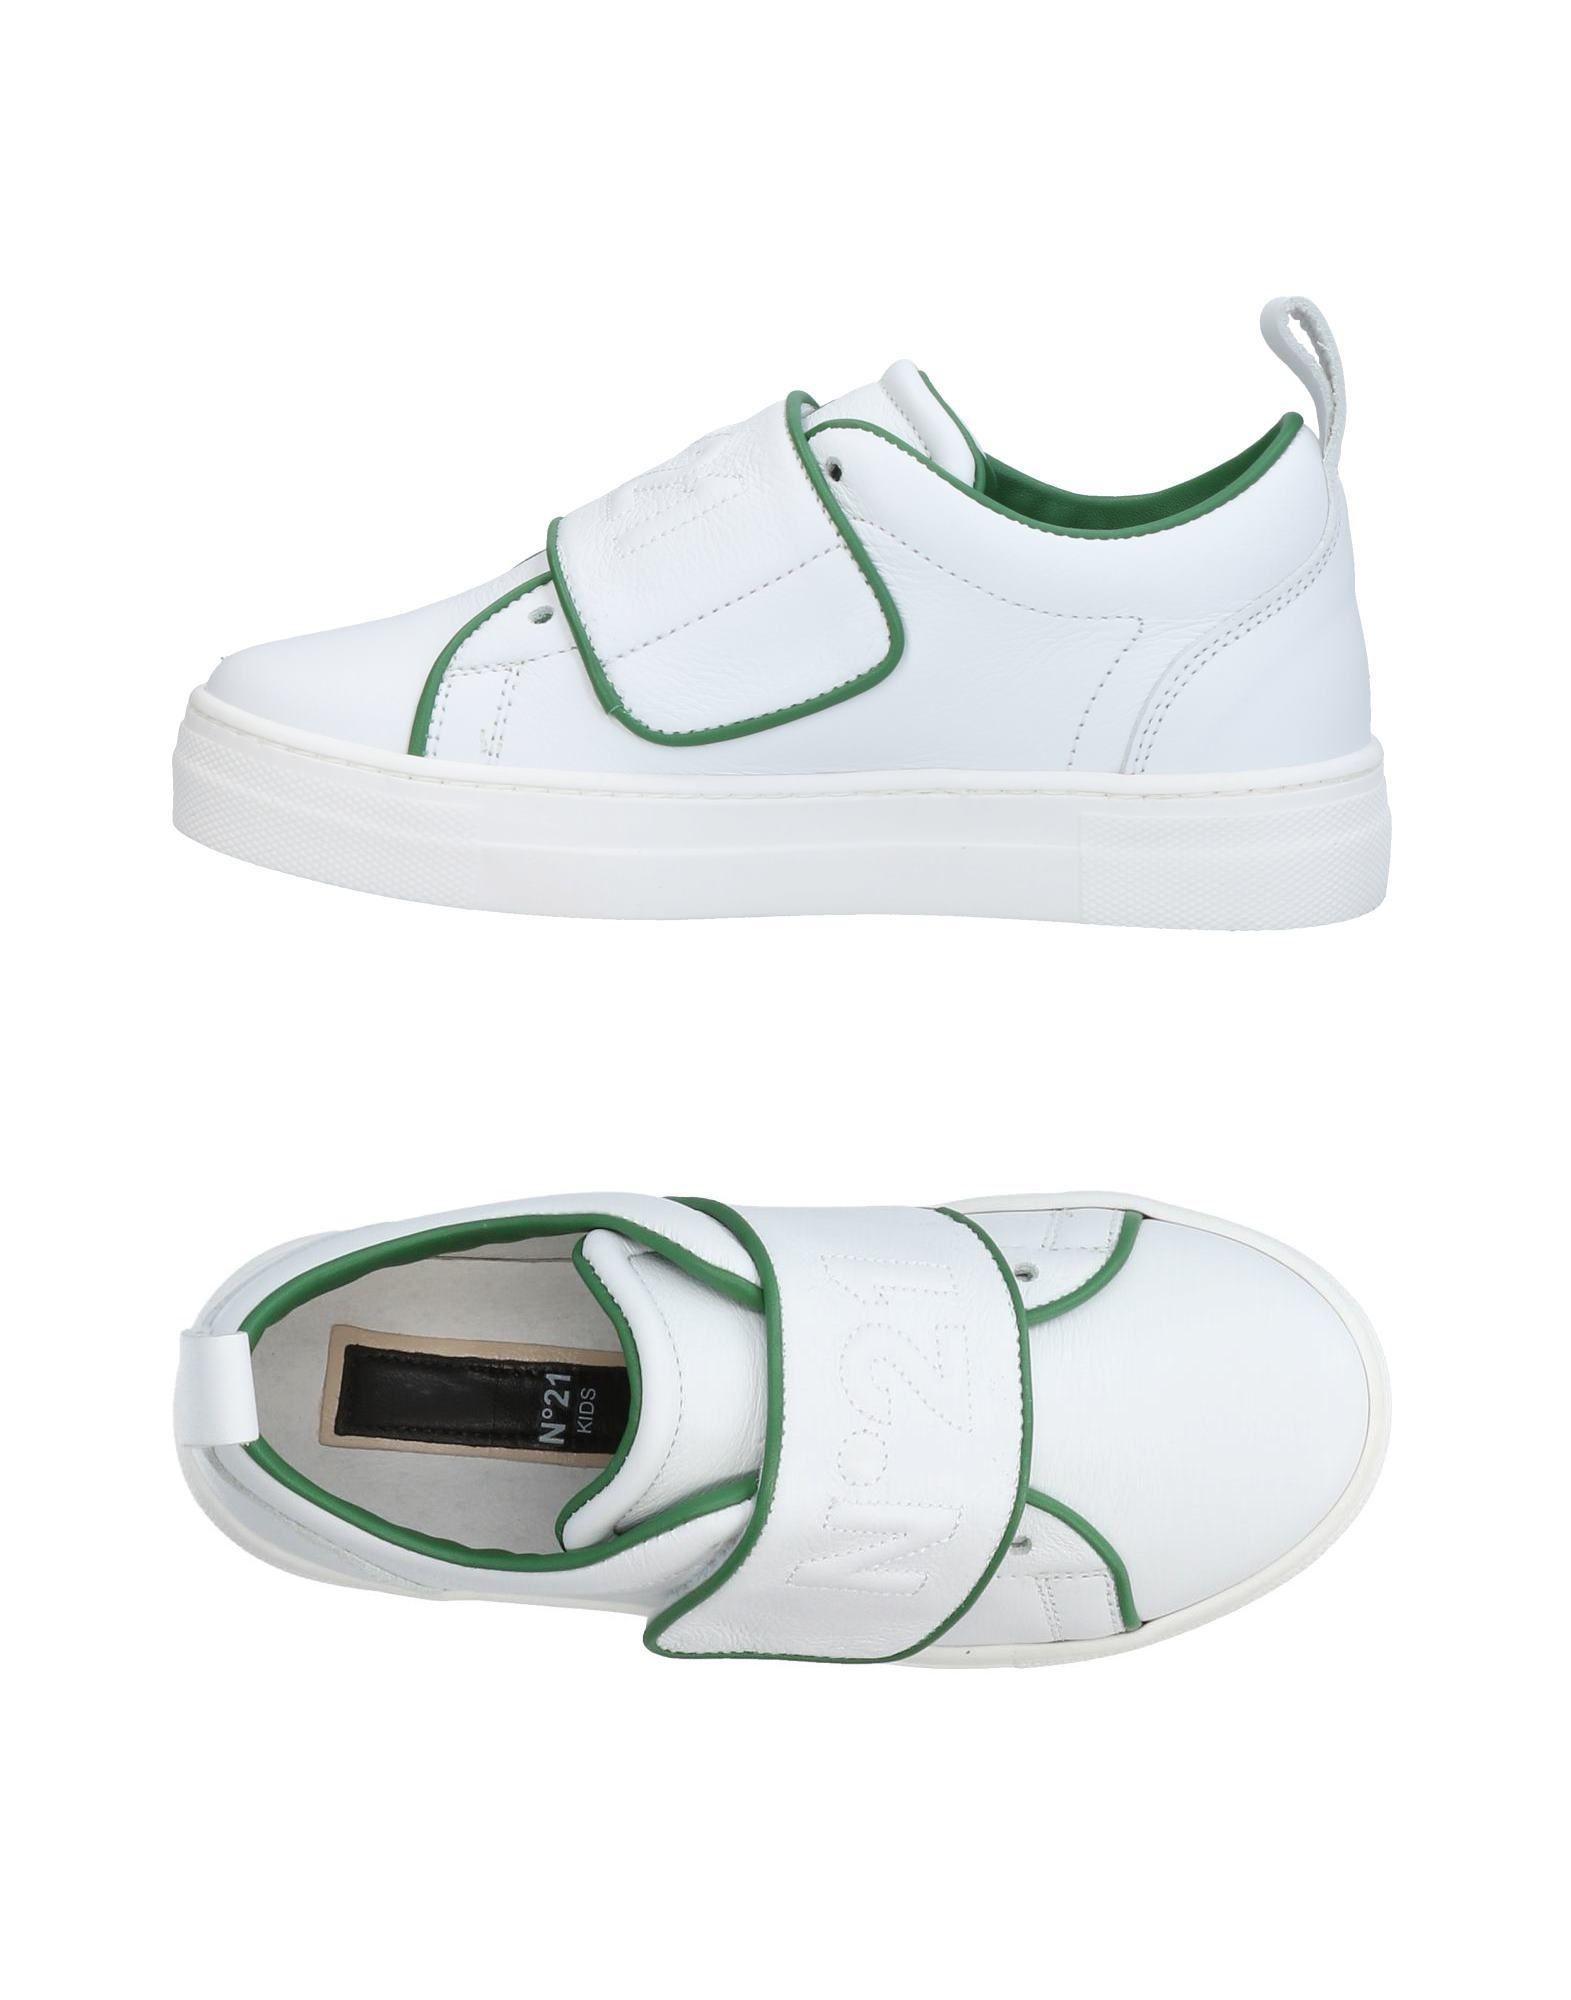 Chaussures - Bas-tops Et Baskets N21 p6vfzzeOS